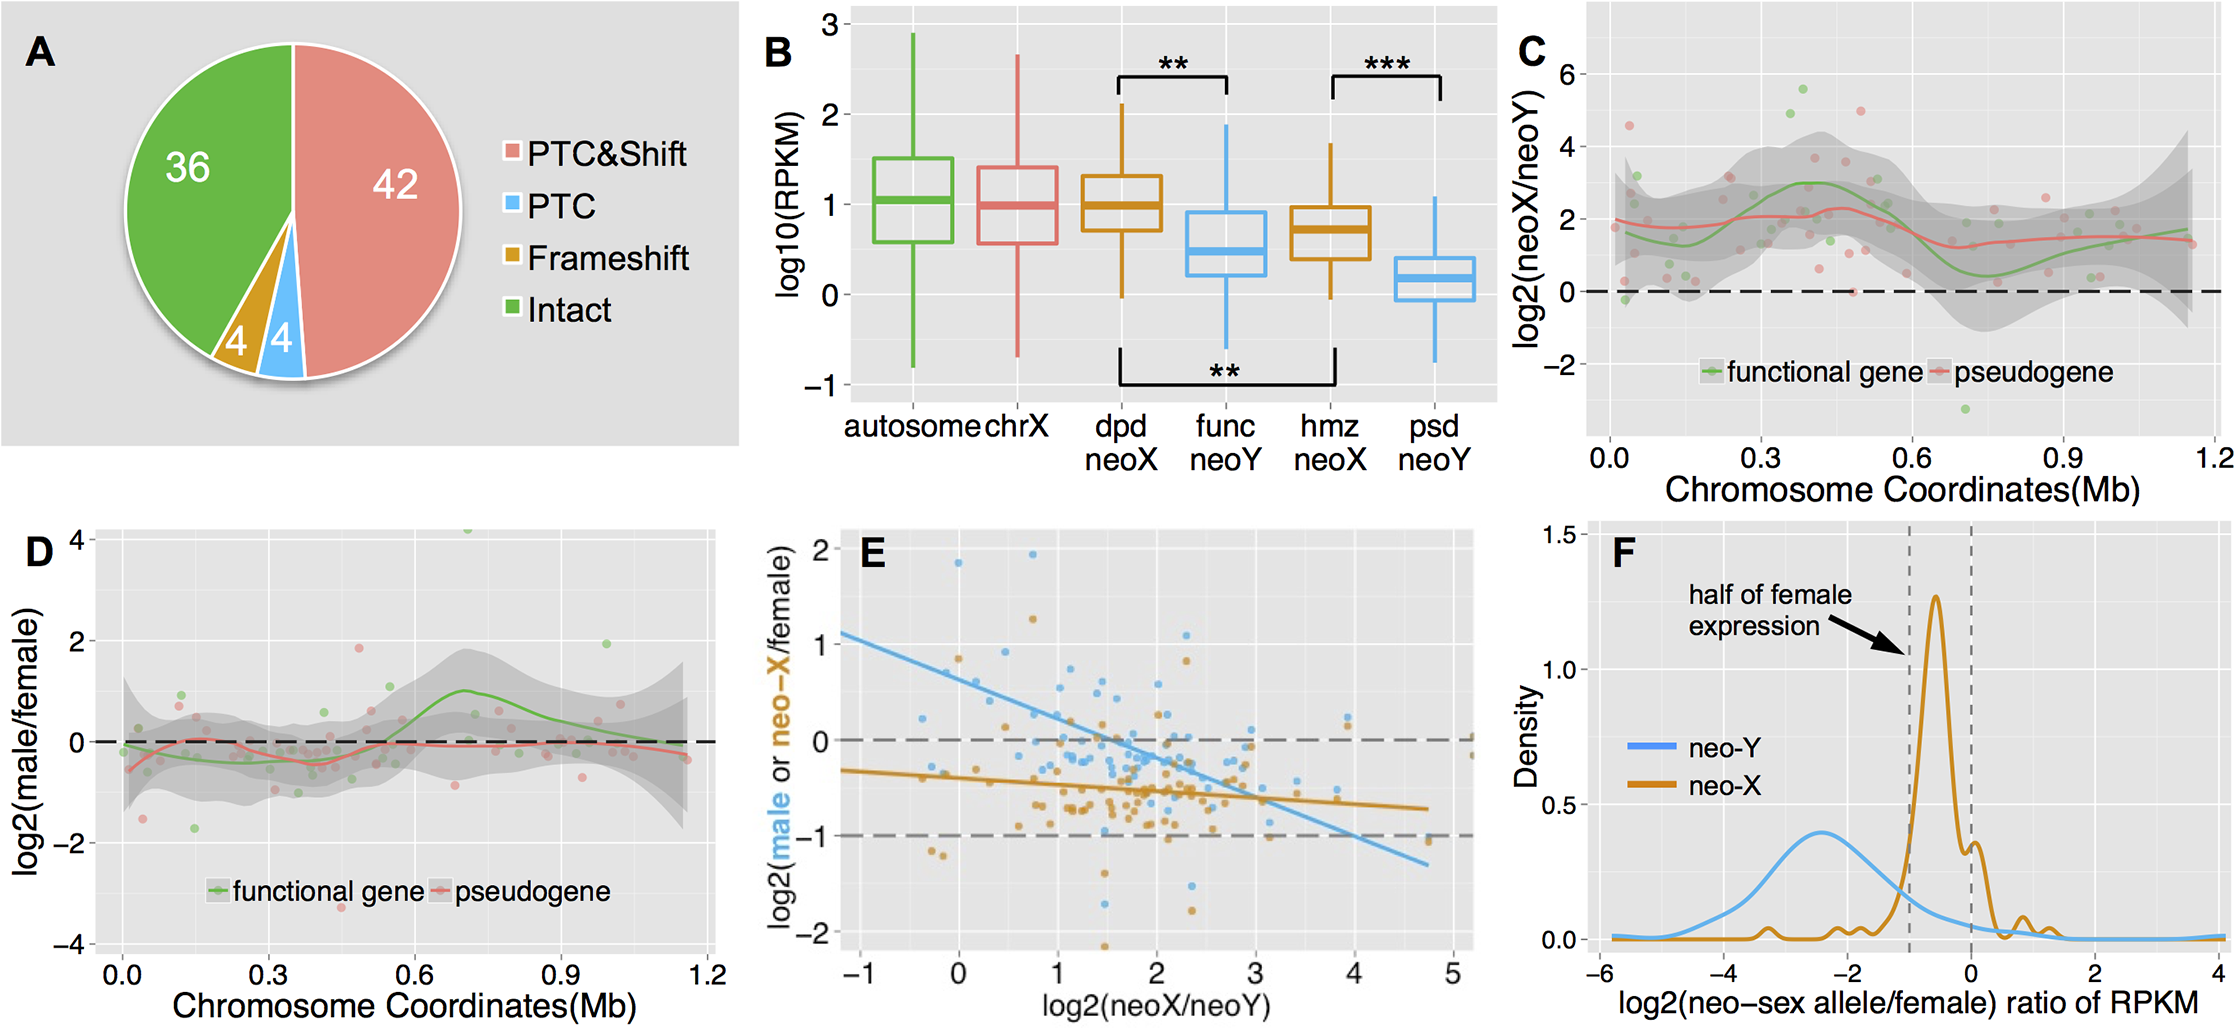 Functional degeneration of neo-Y genes.